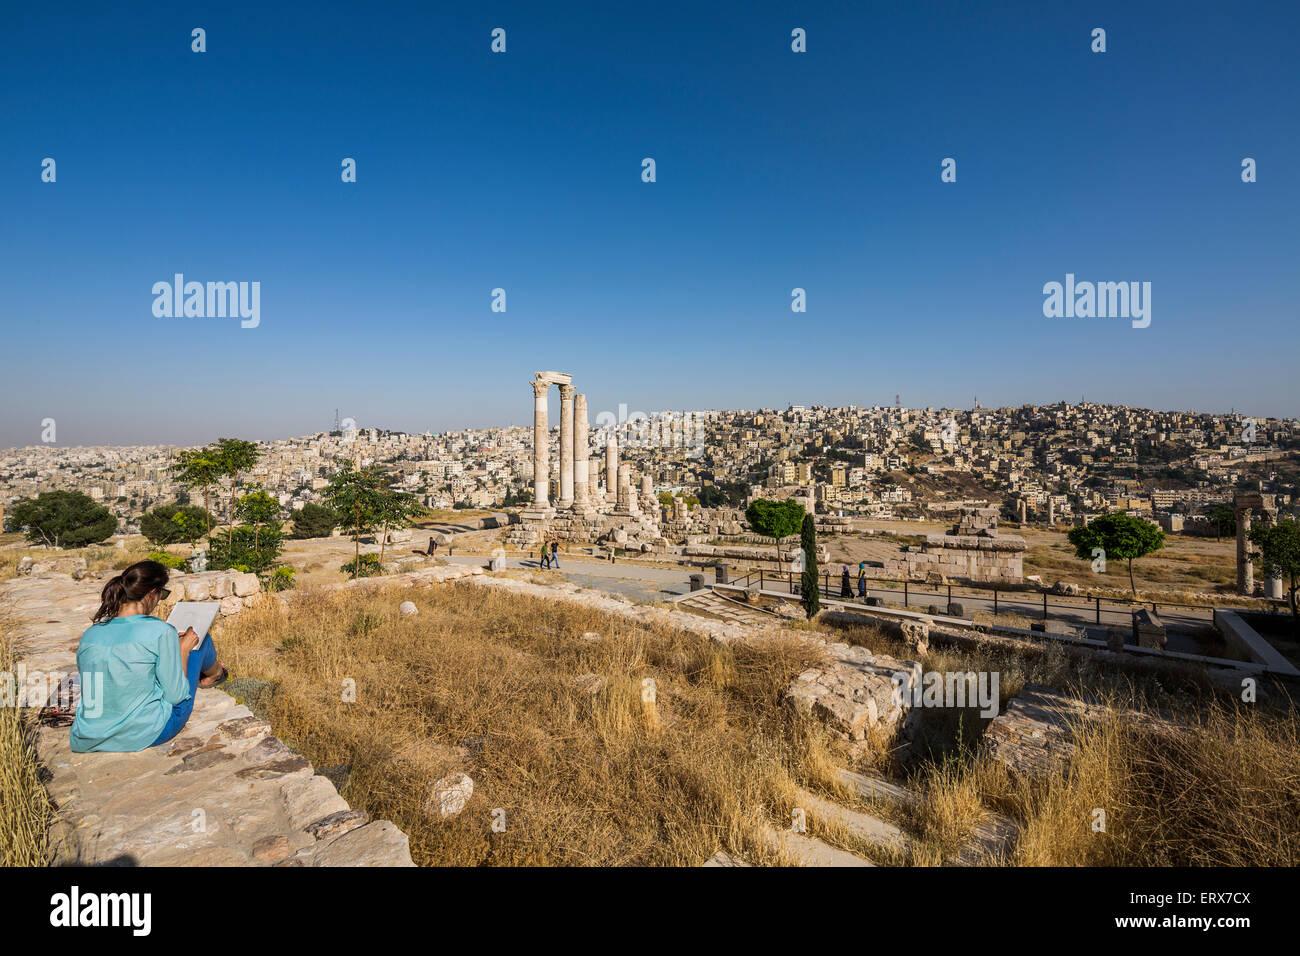 girl sketching Temple of Hercules on the Citadel, Amman, Jordan Stock Photo